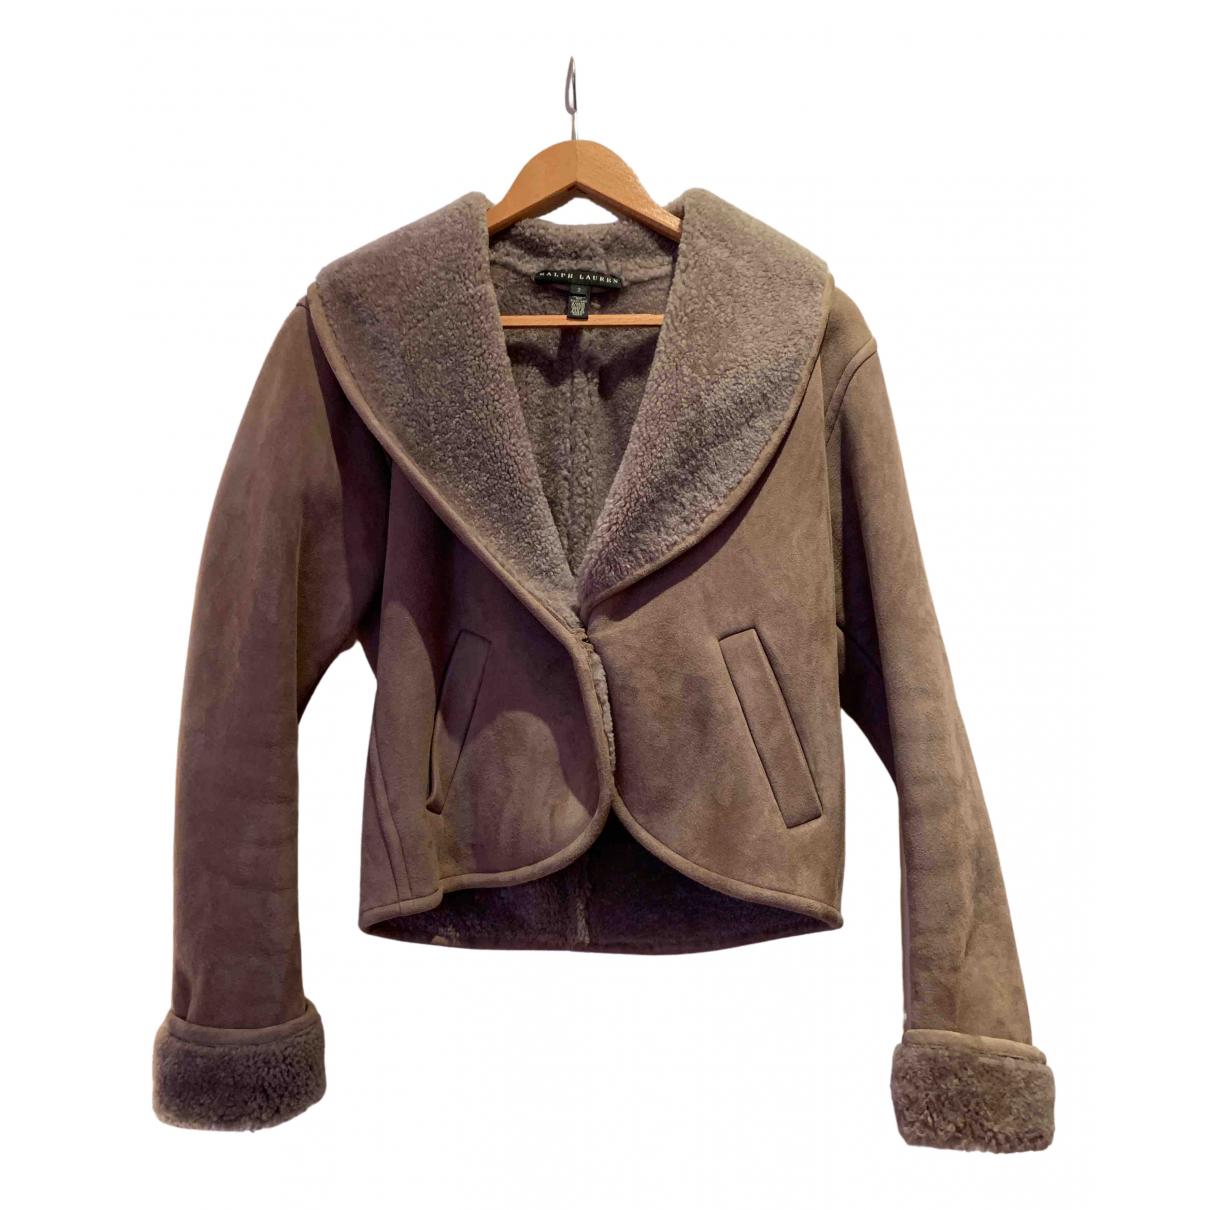 Ralph Lauren N Beige Leather Leather jacket for Women 2 0-5